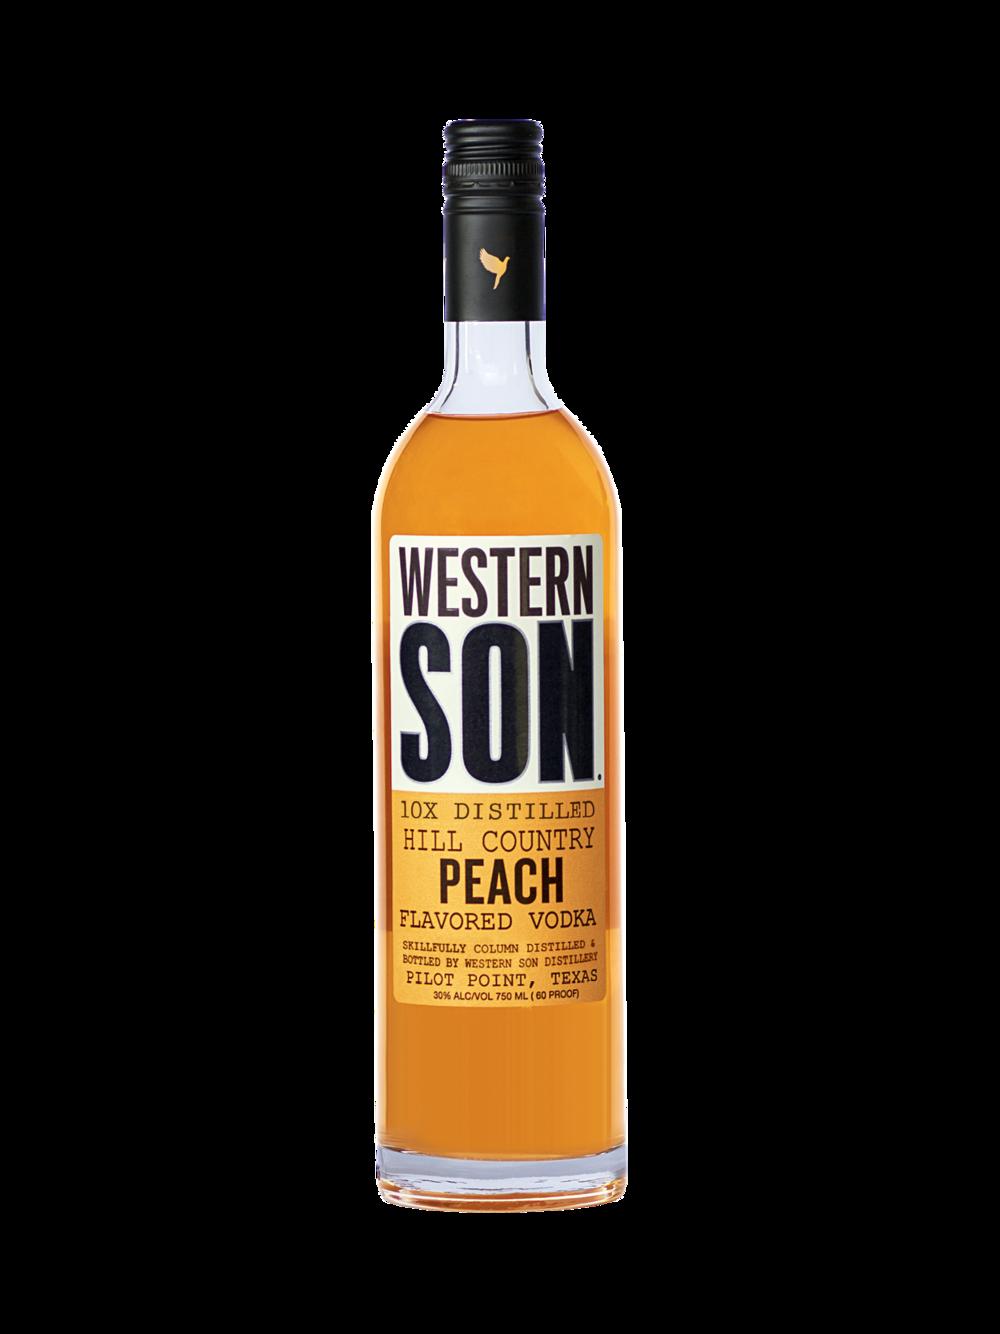 - Hill Country Tea1 part Western Son Peach Vodka2 parts unsweet teaSqueeze of lemonPeach Basil Western Mule2 parts Western Son Peach Vodka4 parts Western Son Ginger Beer2 basil leavesSqueeze of lime